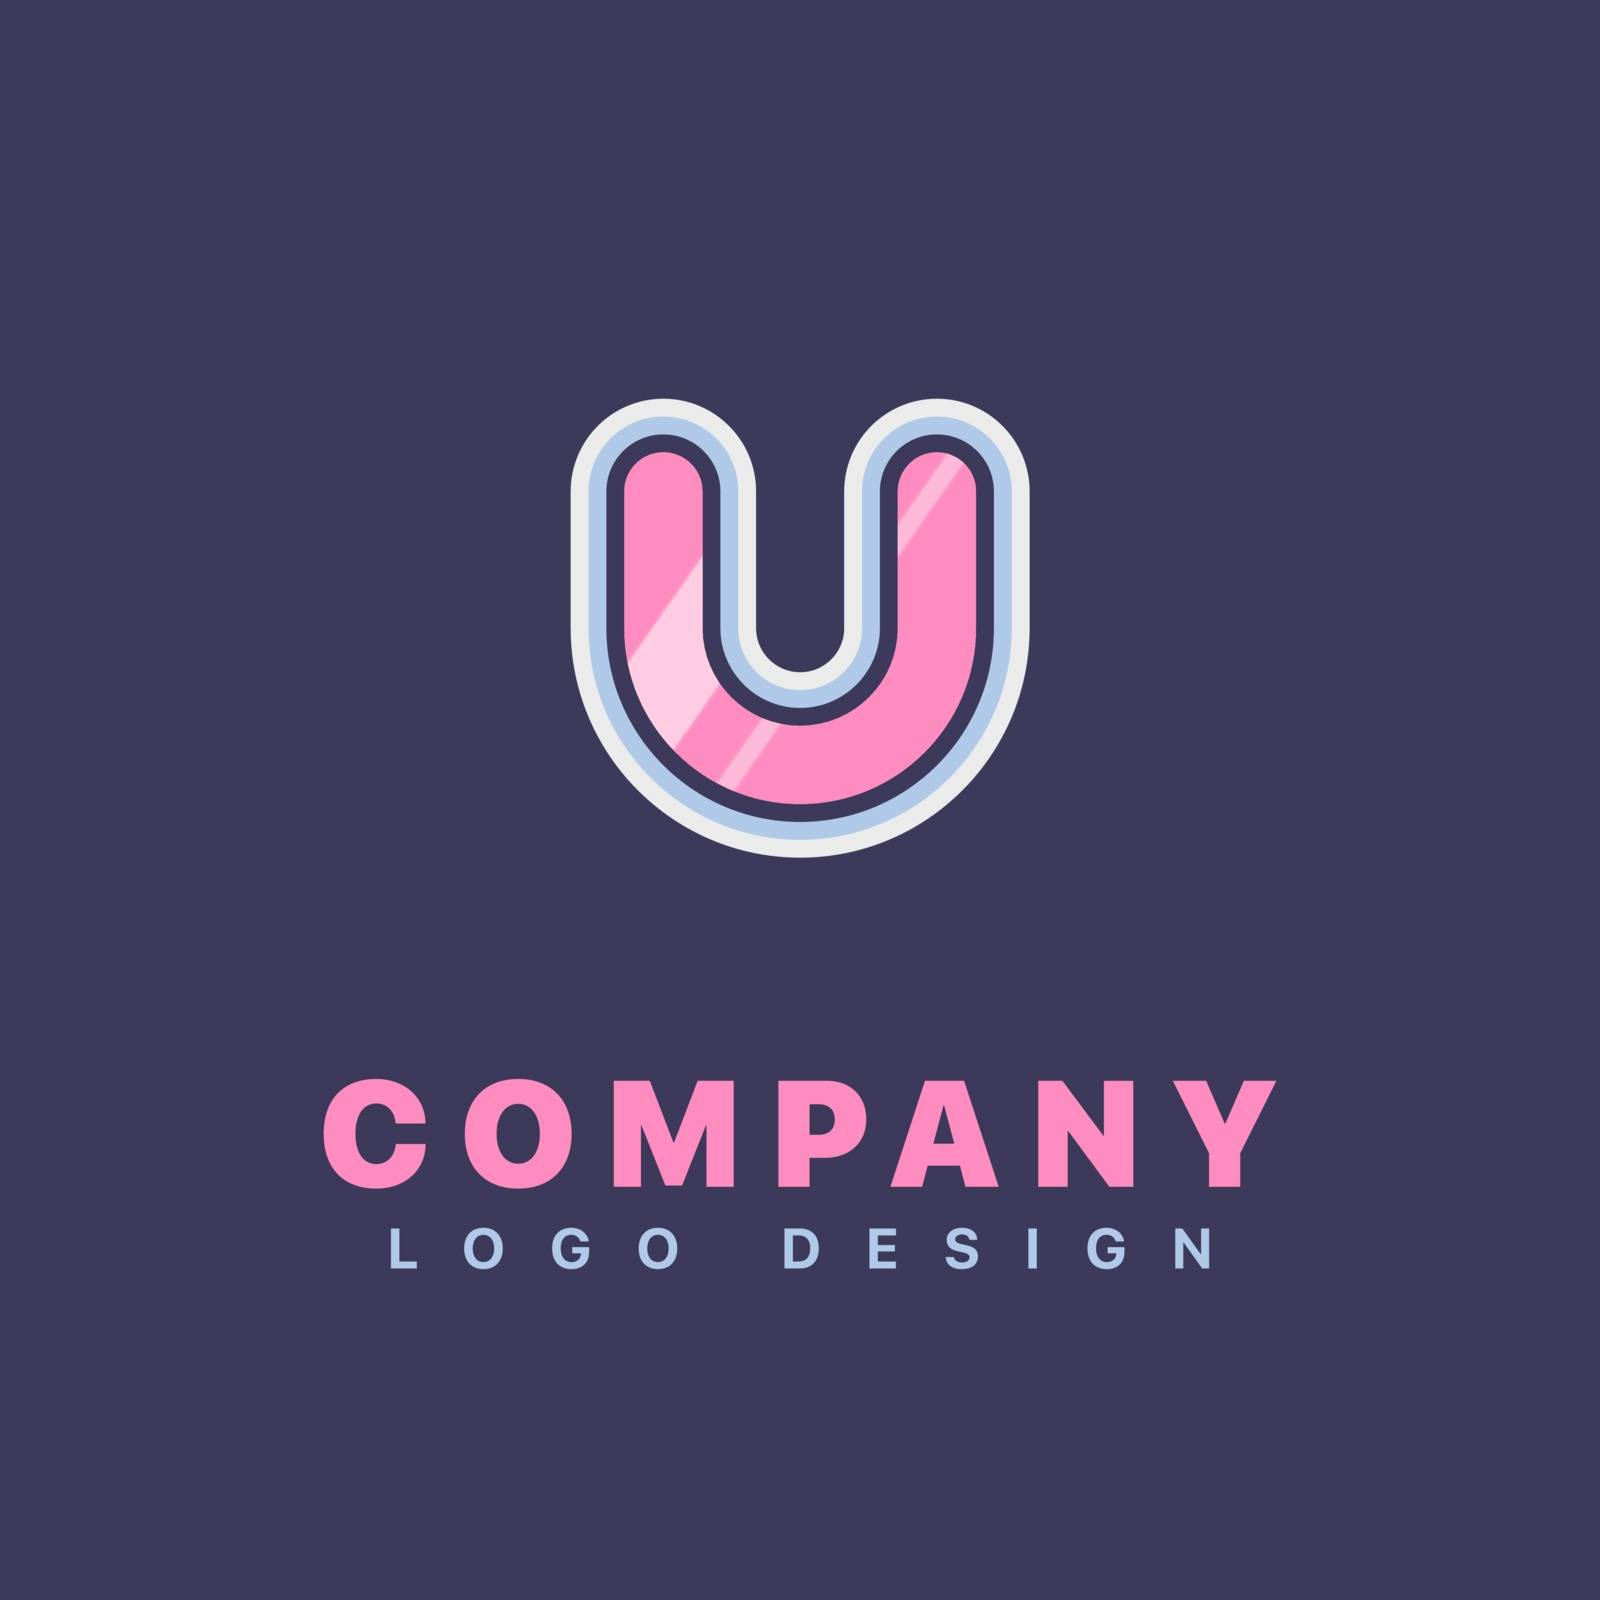 Letter V logo design template. Company logo icon